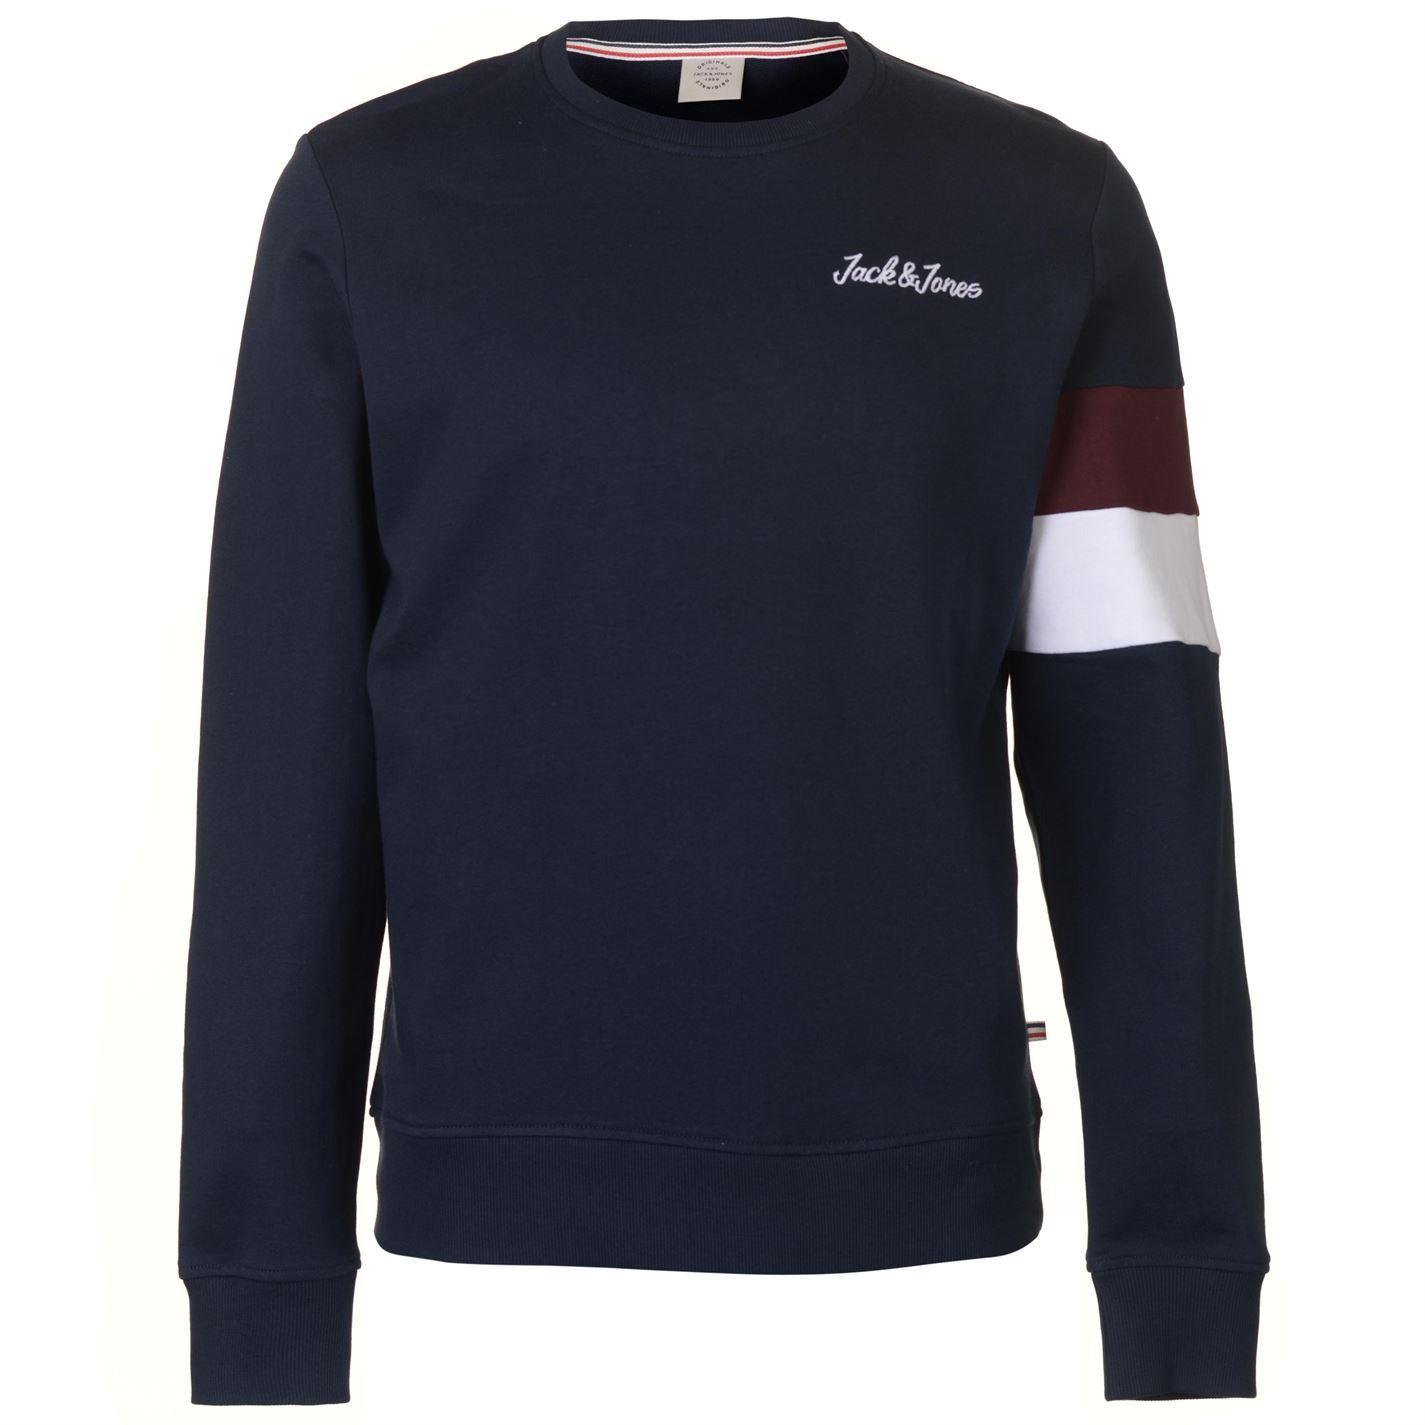 Crew Haut Pull Originals Jorwinks Pour Sweater Homme JackJones à wXuZTOkiP